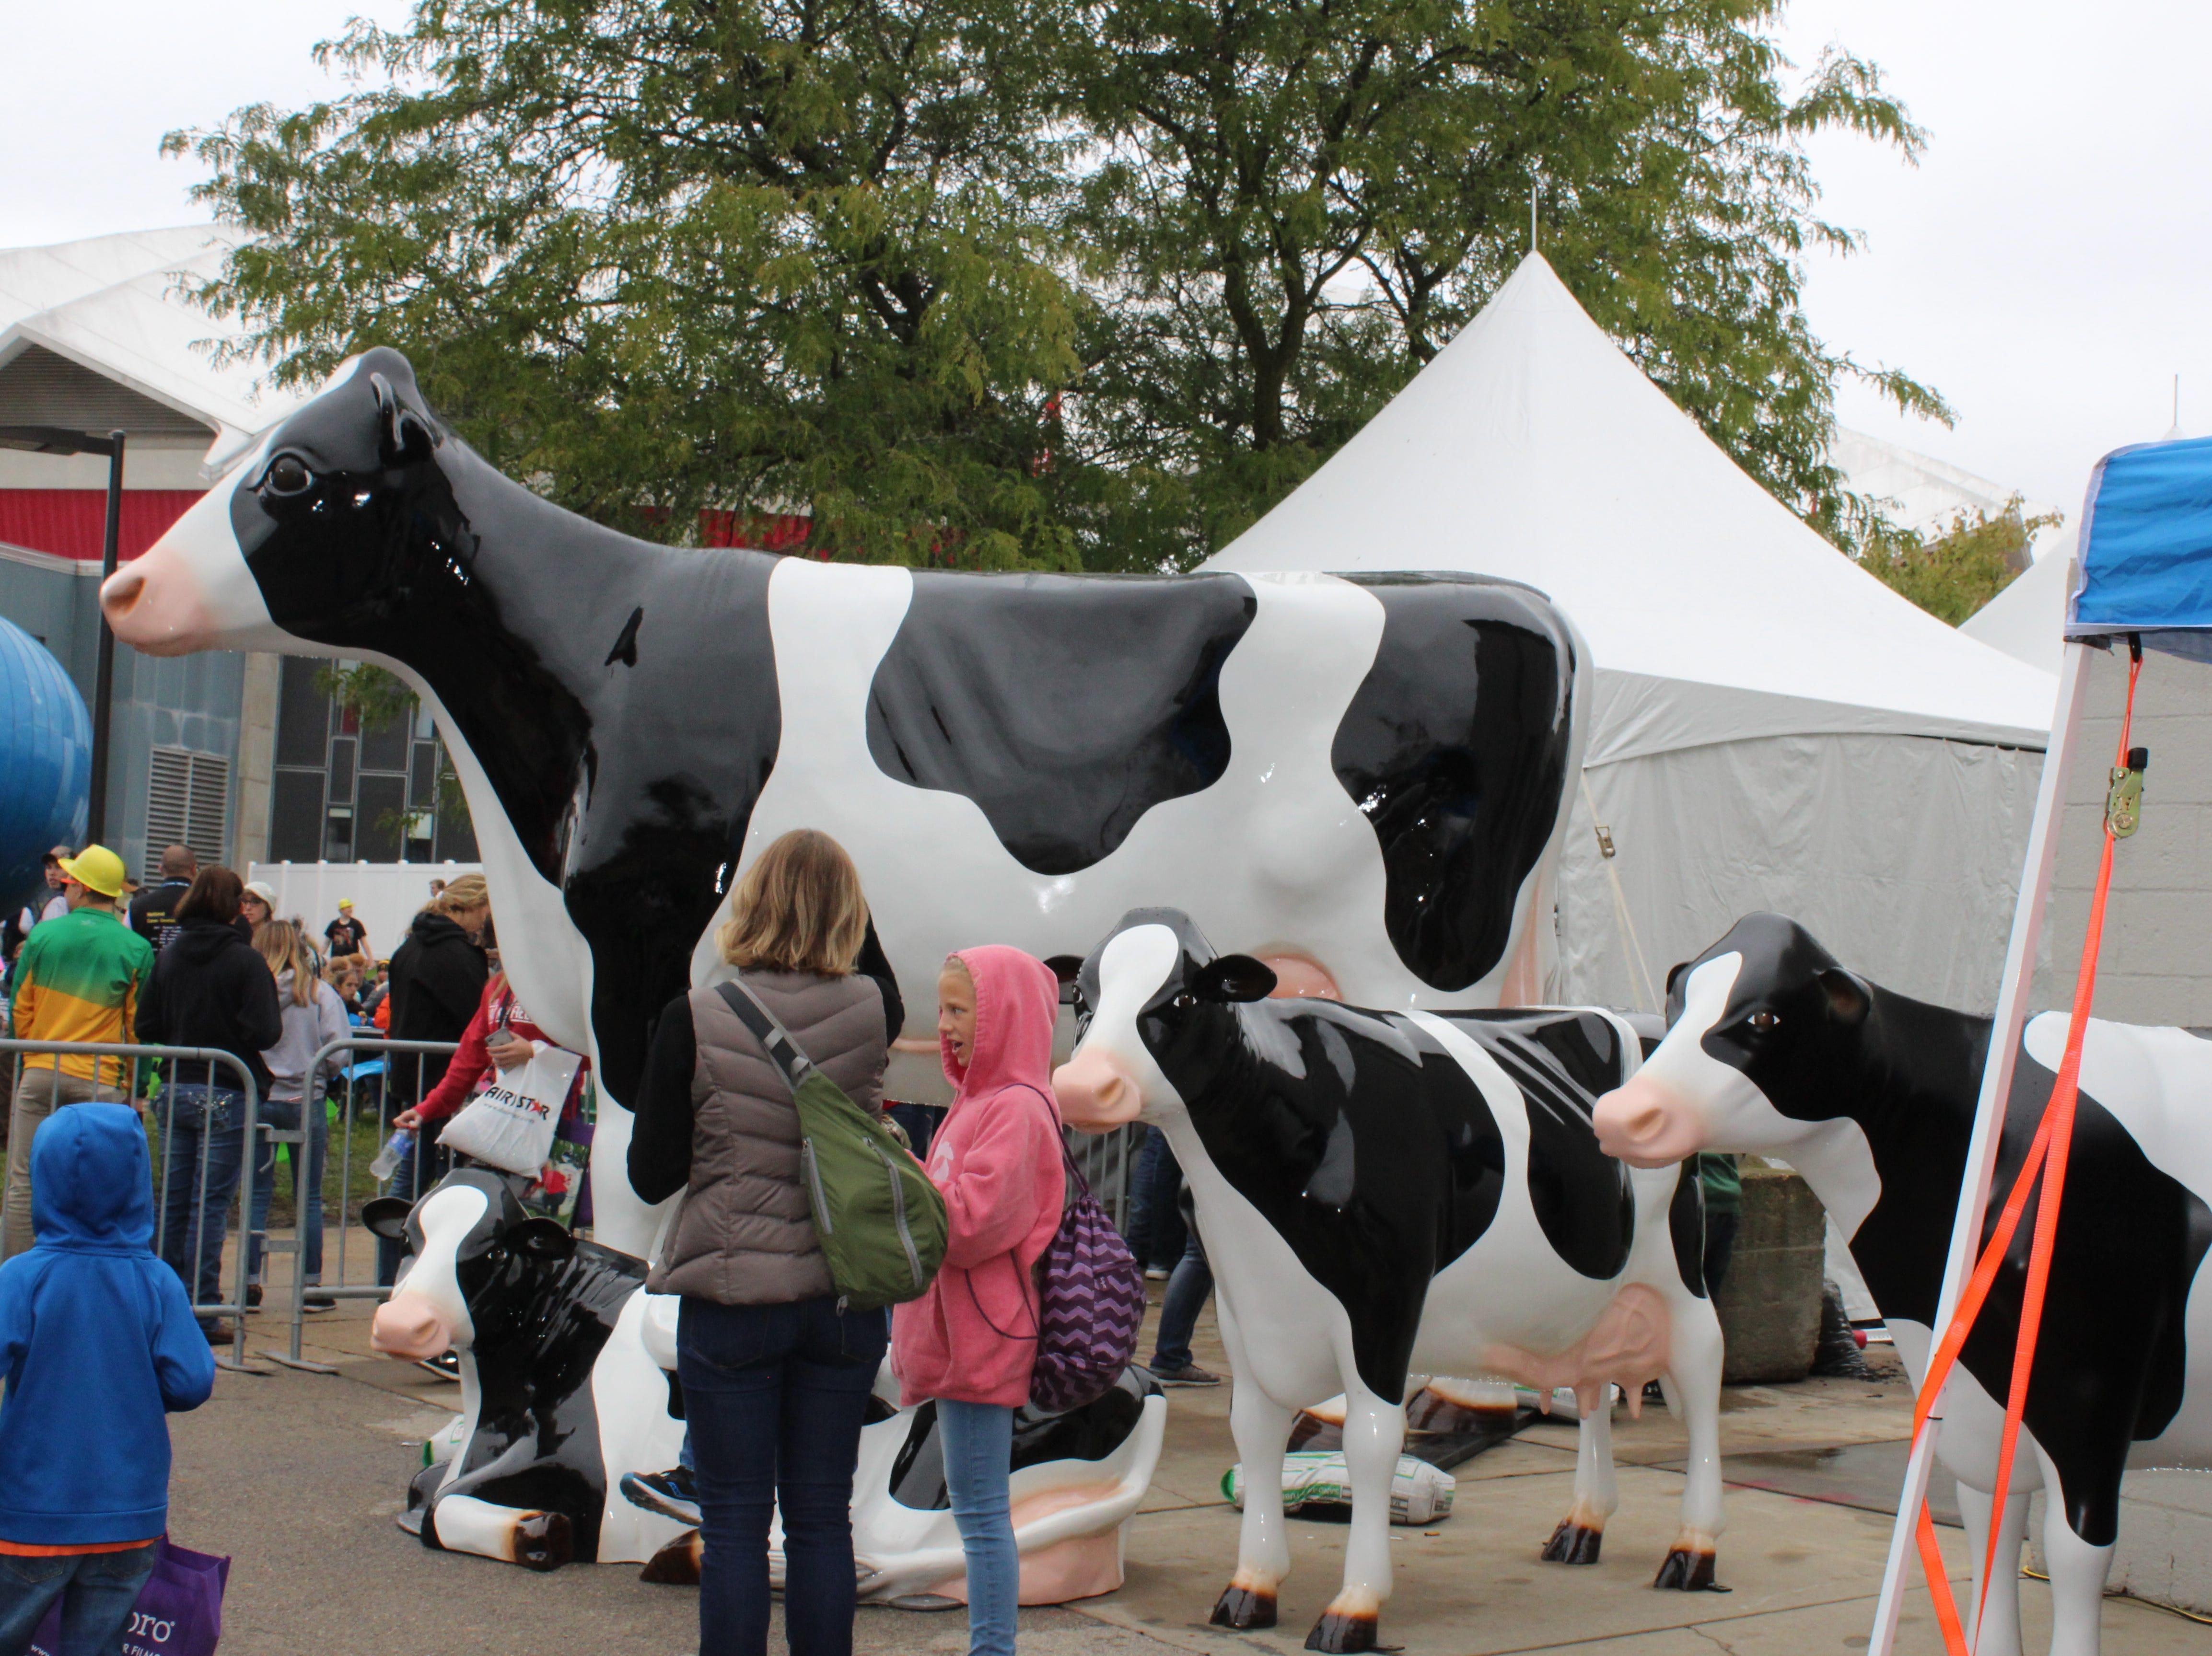 Kids can't resist the large fiberglass bovine family.